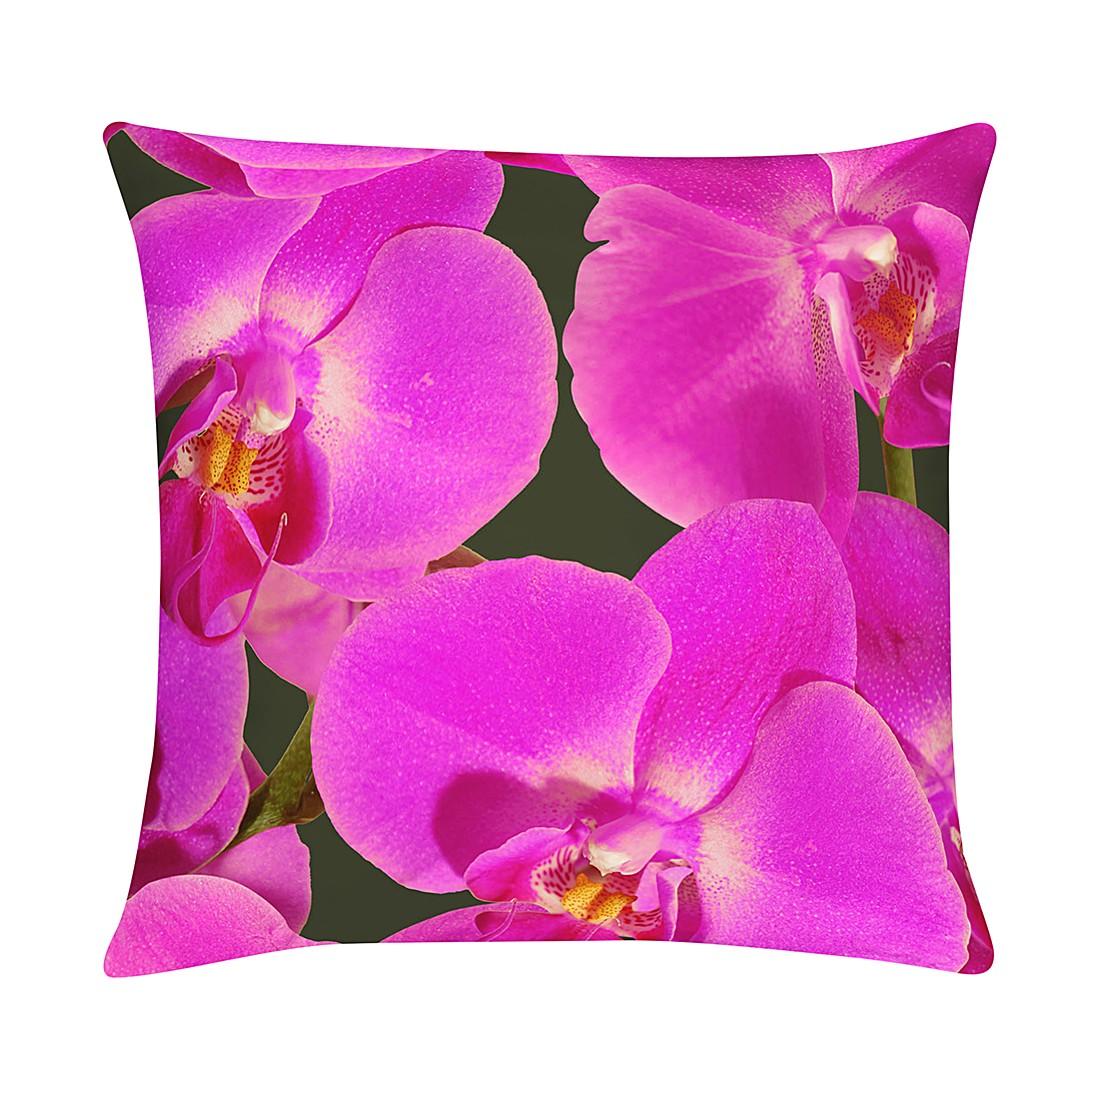 Federa per cuscino Orchidee - Viola - 40 x 40 cm, Apelt